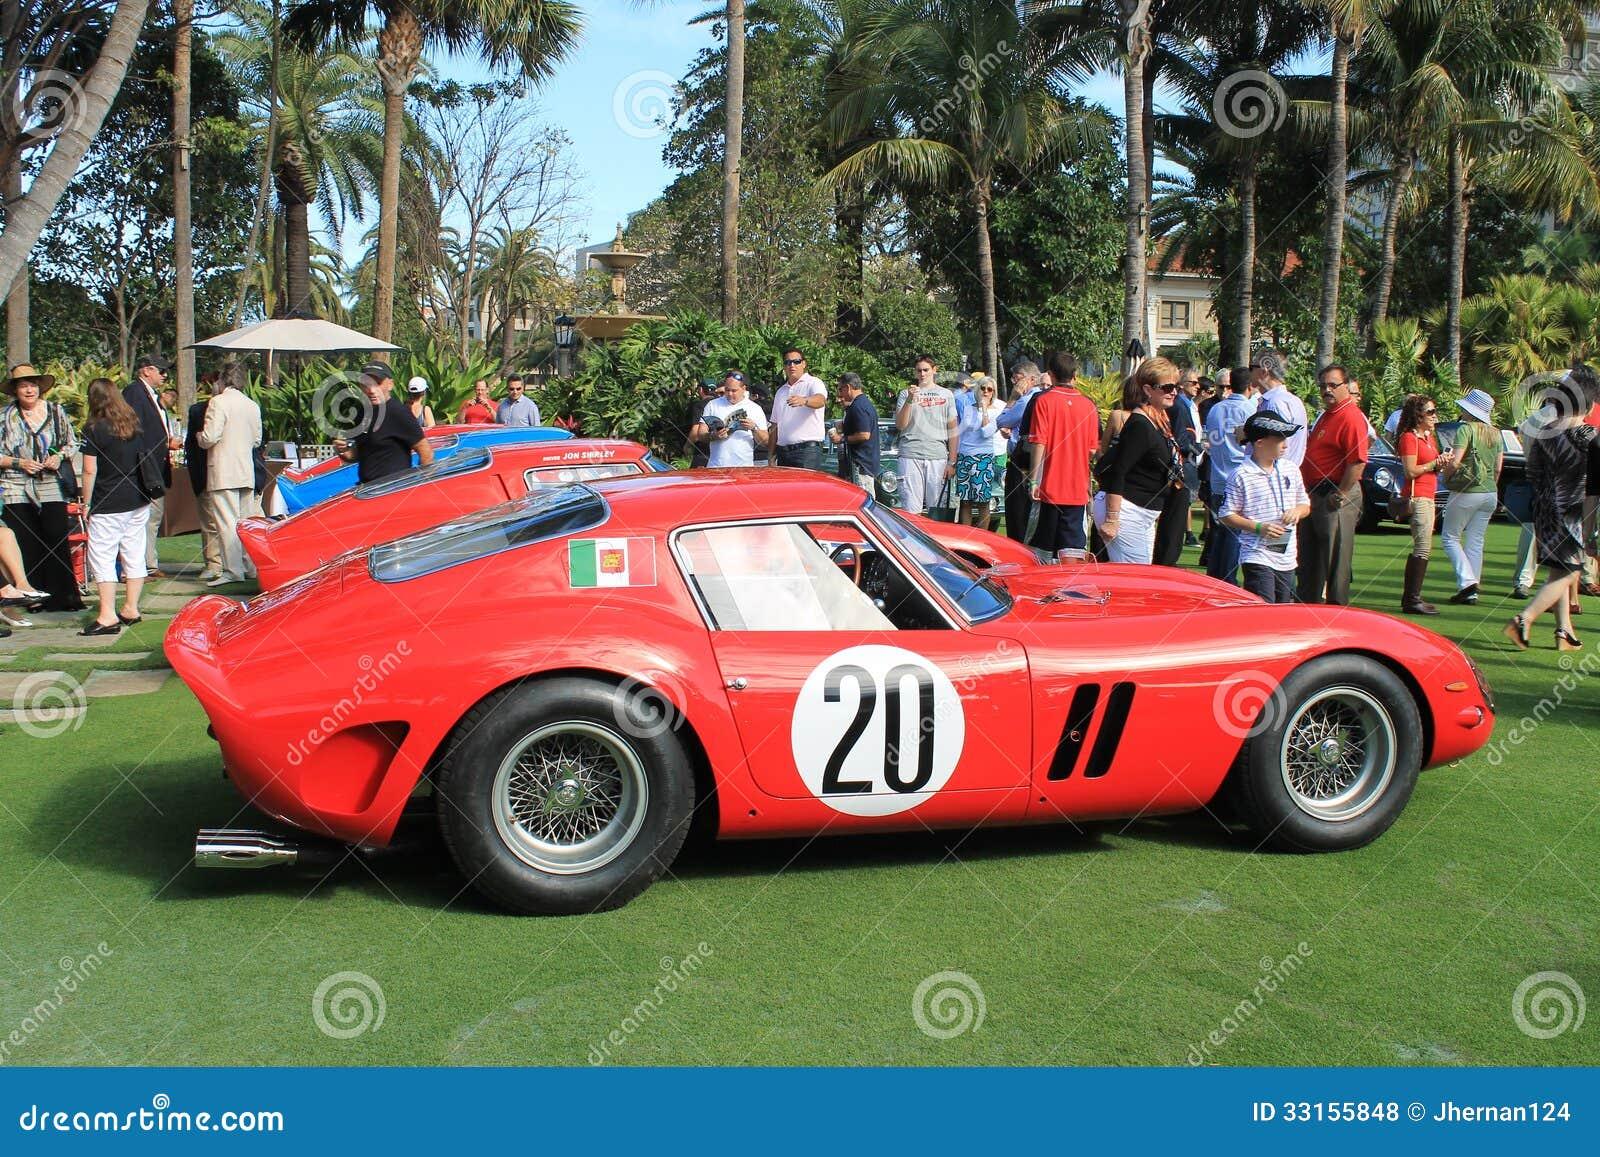 Ferrari 250 Gto Racecar Side Editorial Stock Photo Image Of Kamm Hotel 33155848